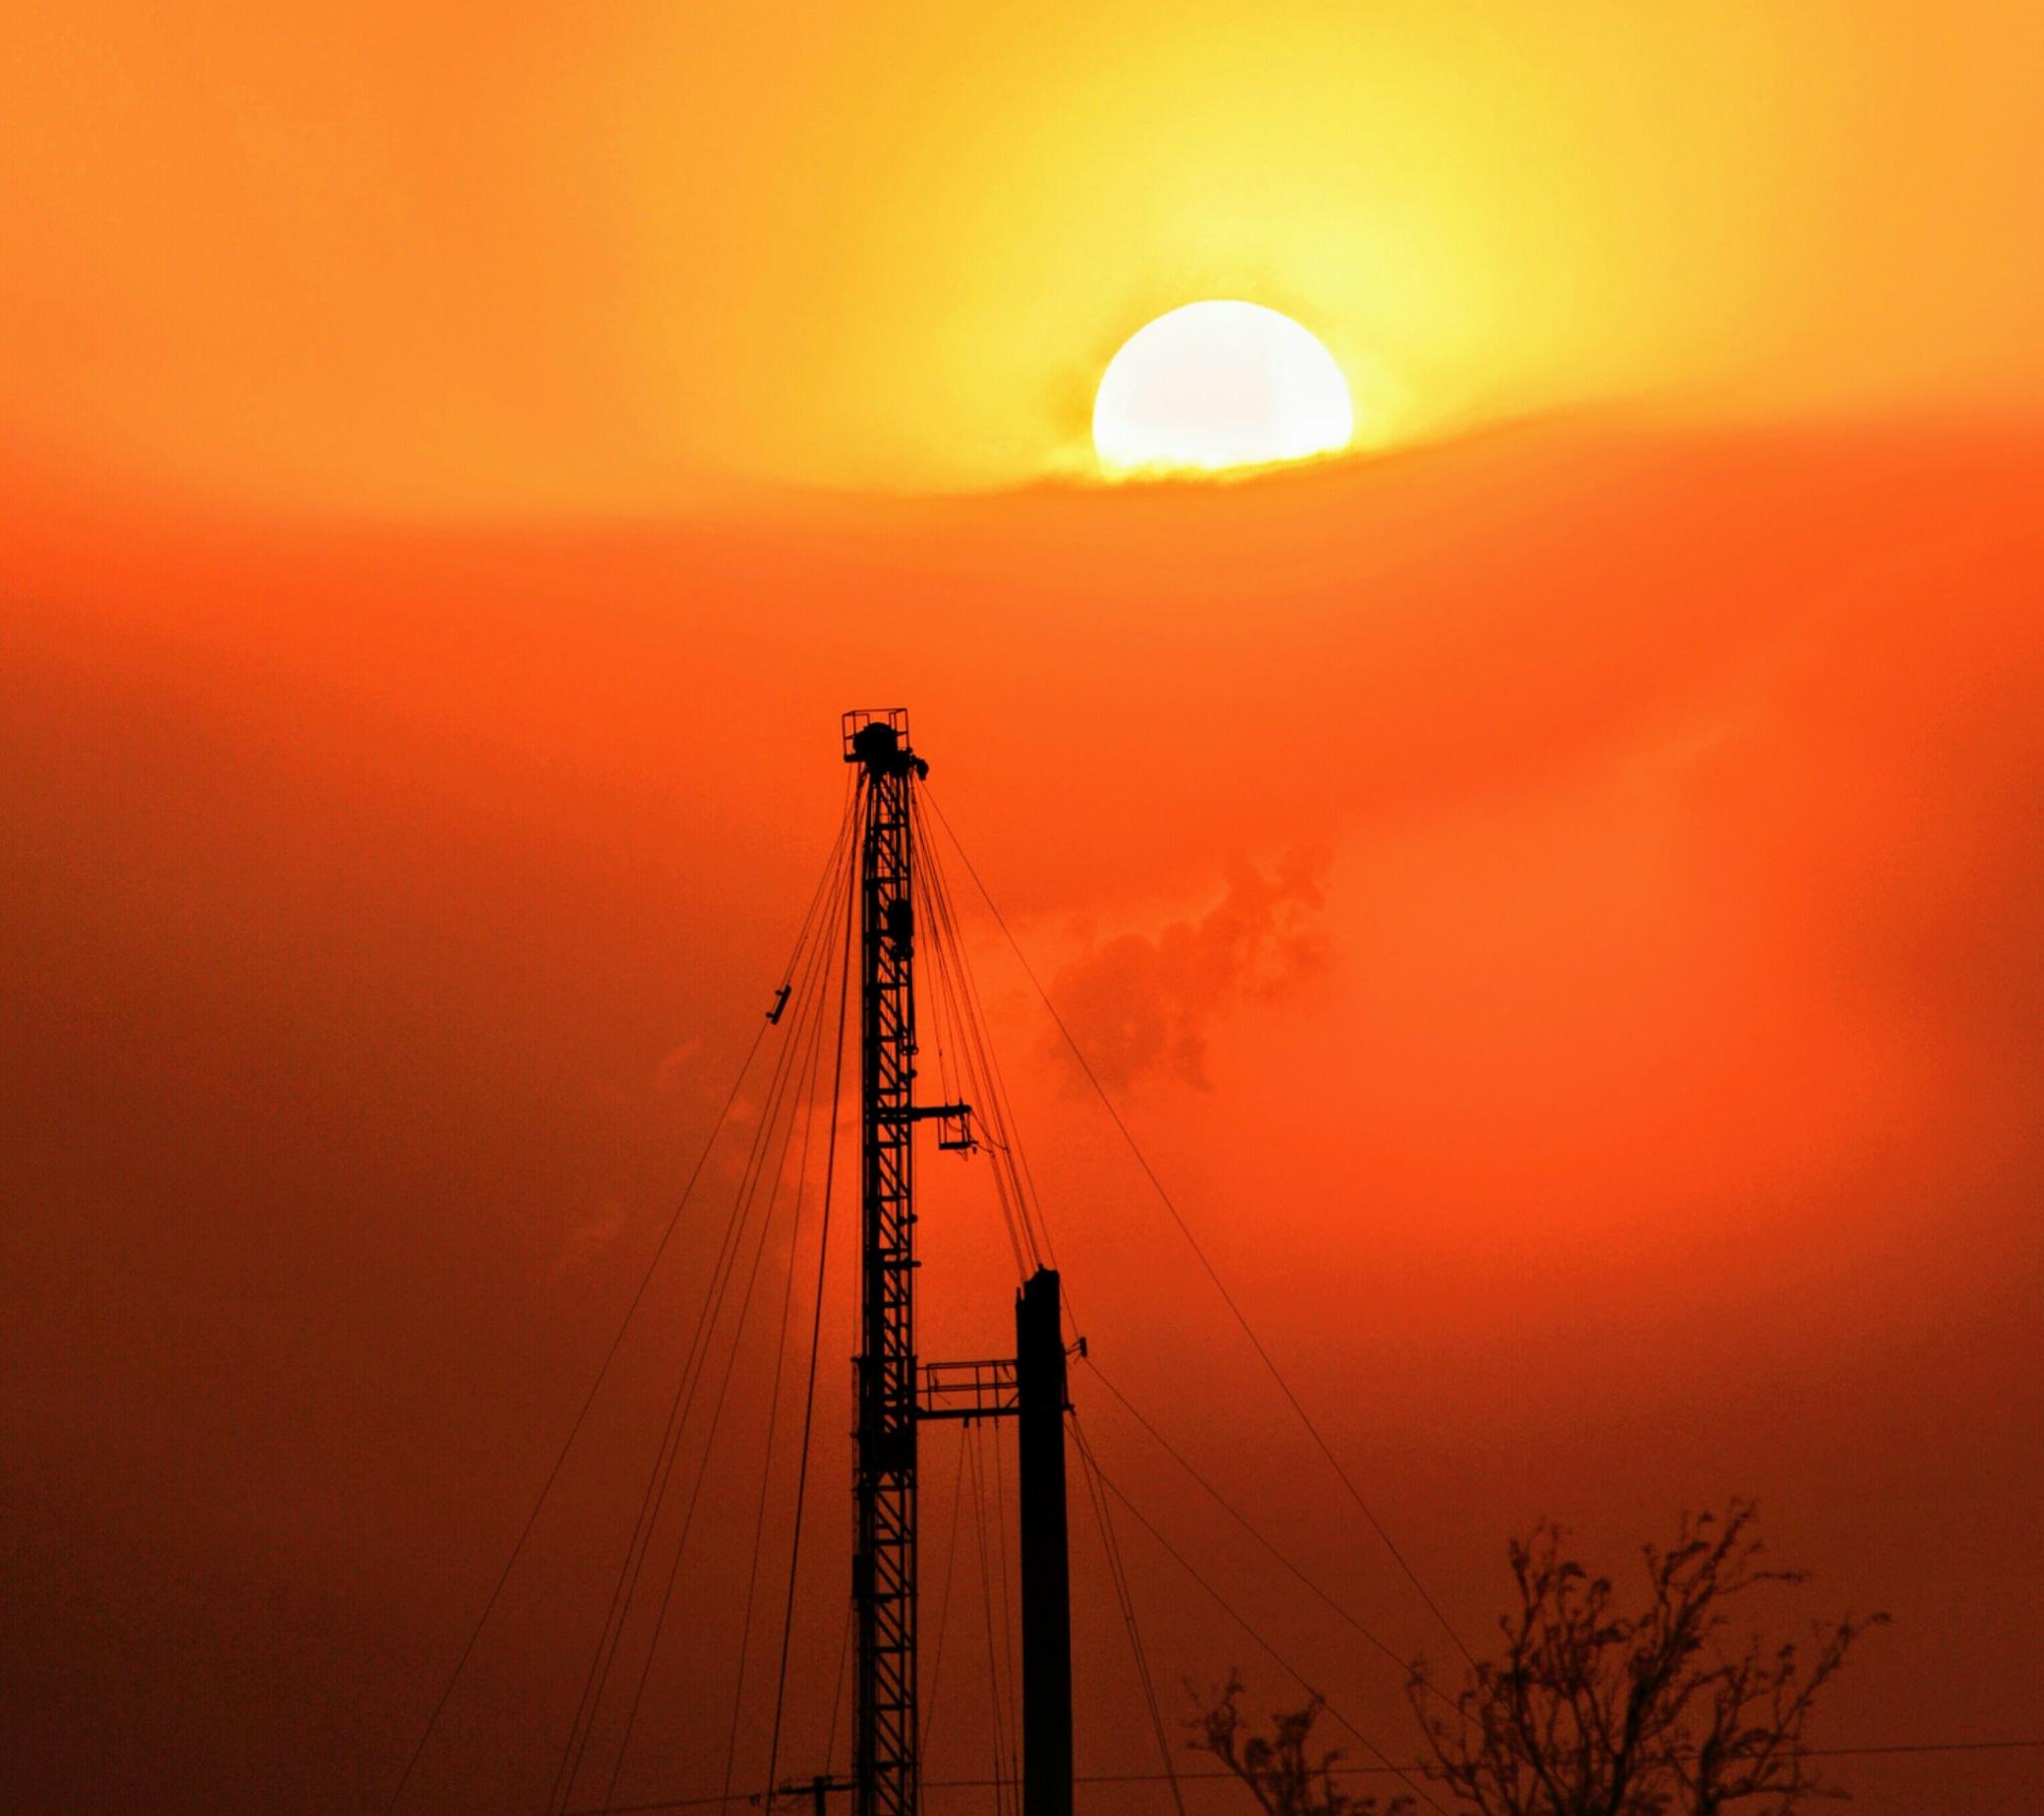 Sunset - Permian Basin by jphall